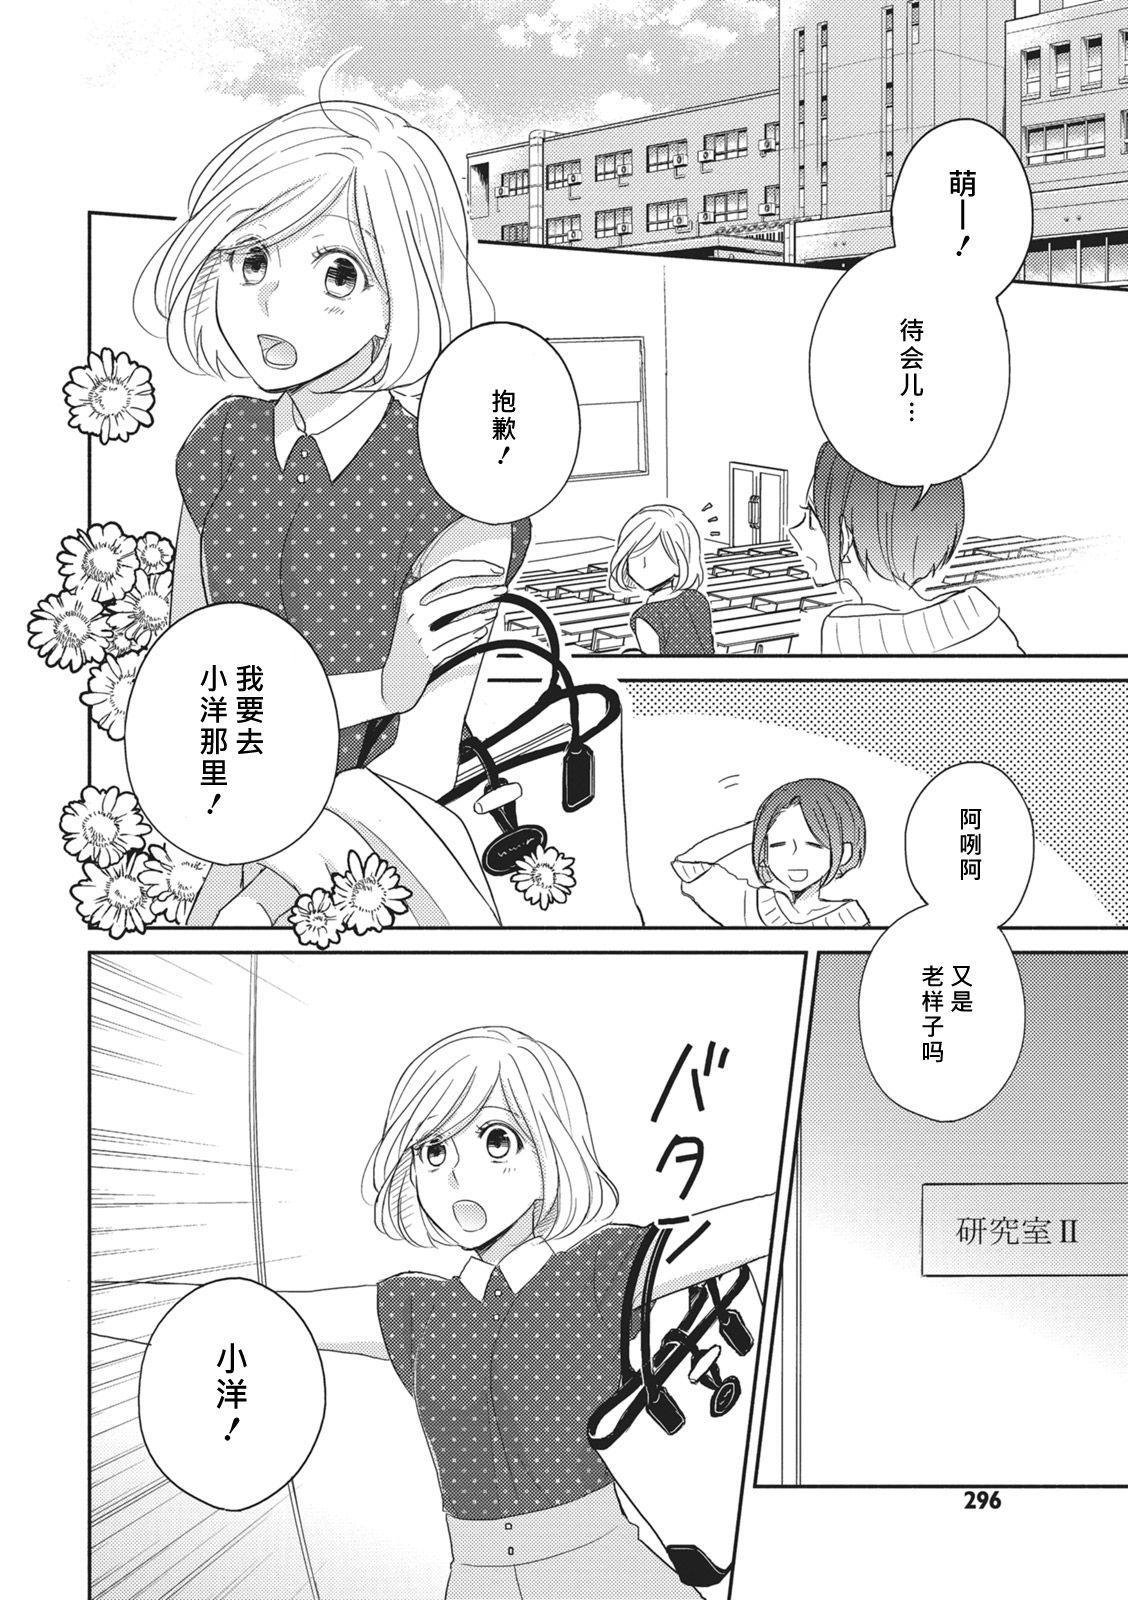 HaTsuKoi LOGIC | 初恋逻辑 1